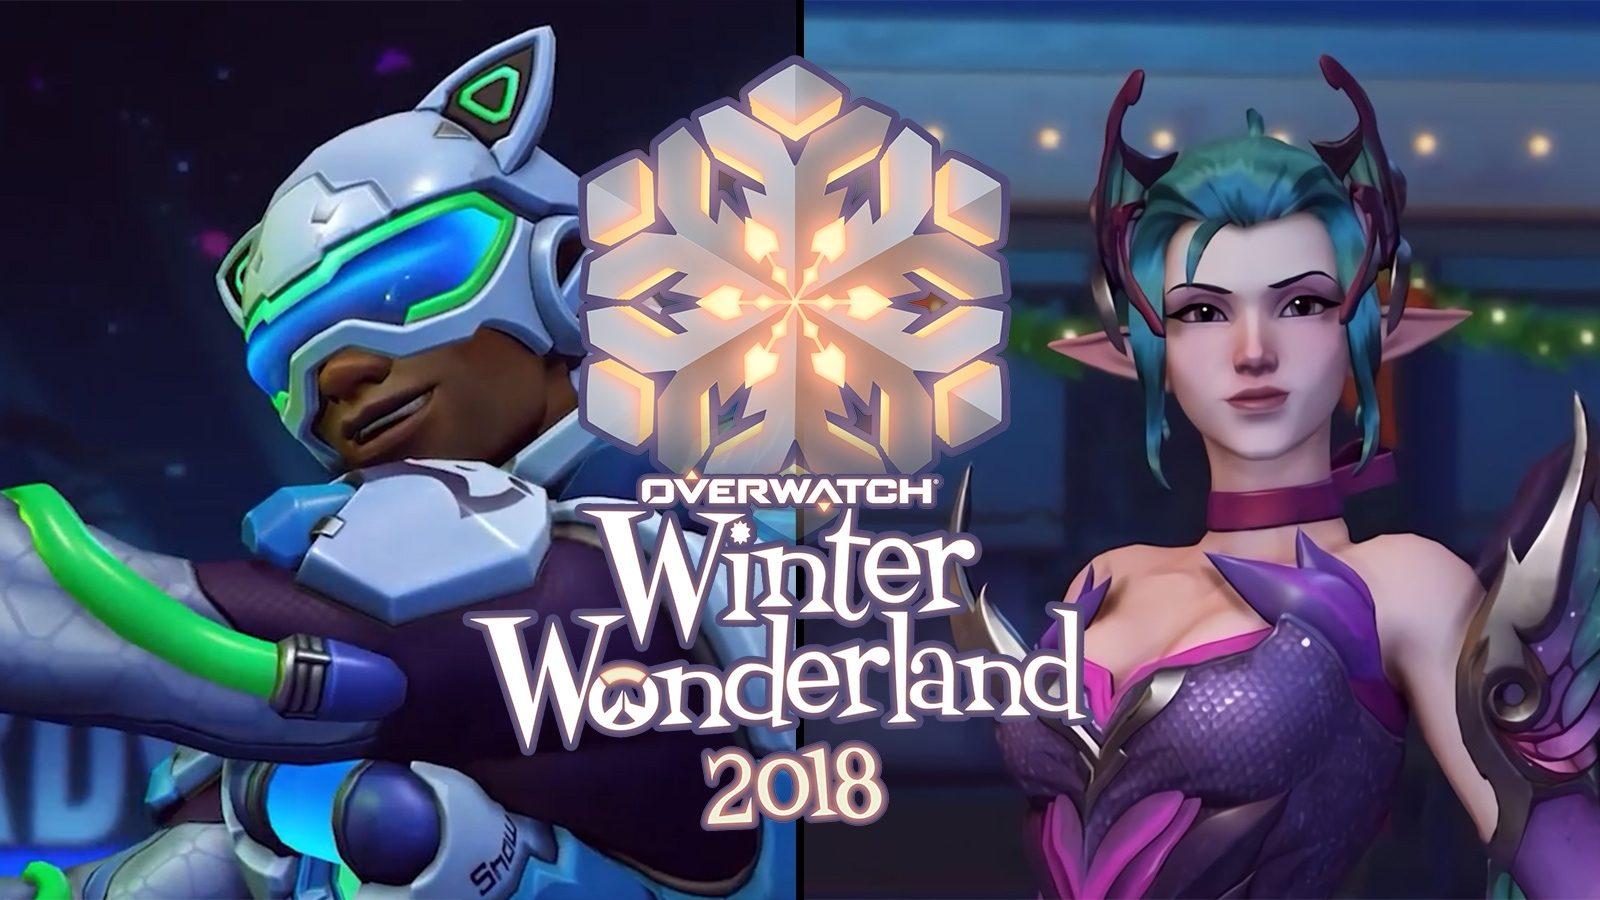 Overwatch Winter Wonderland 2018 Skins Game Modes And More Dexerto